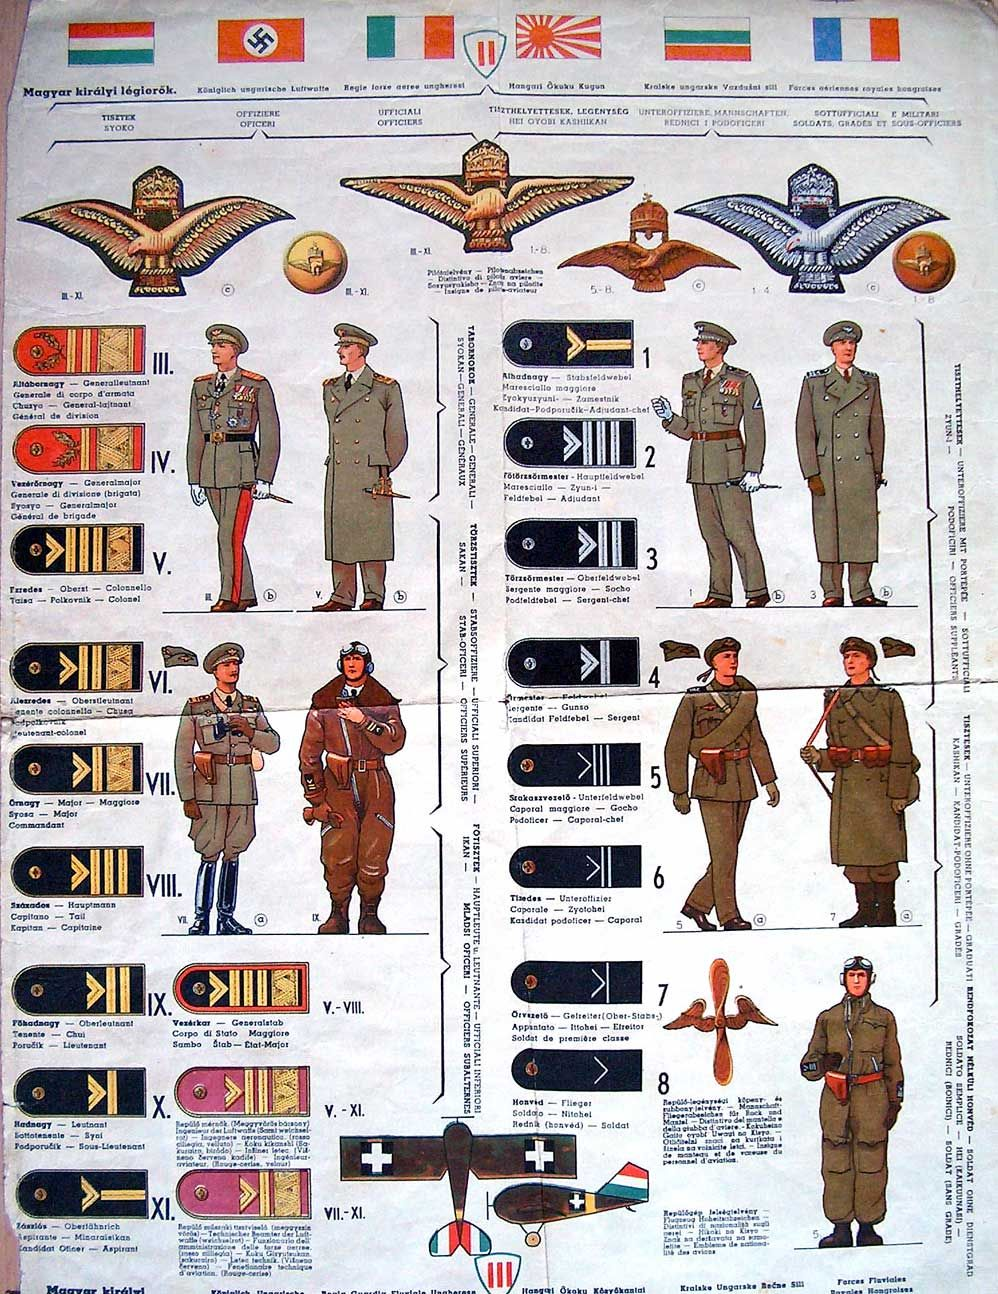 Uniforms and insignia of the Schutzstaffel | Military Wiki ...